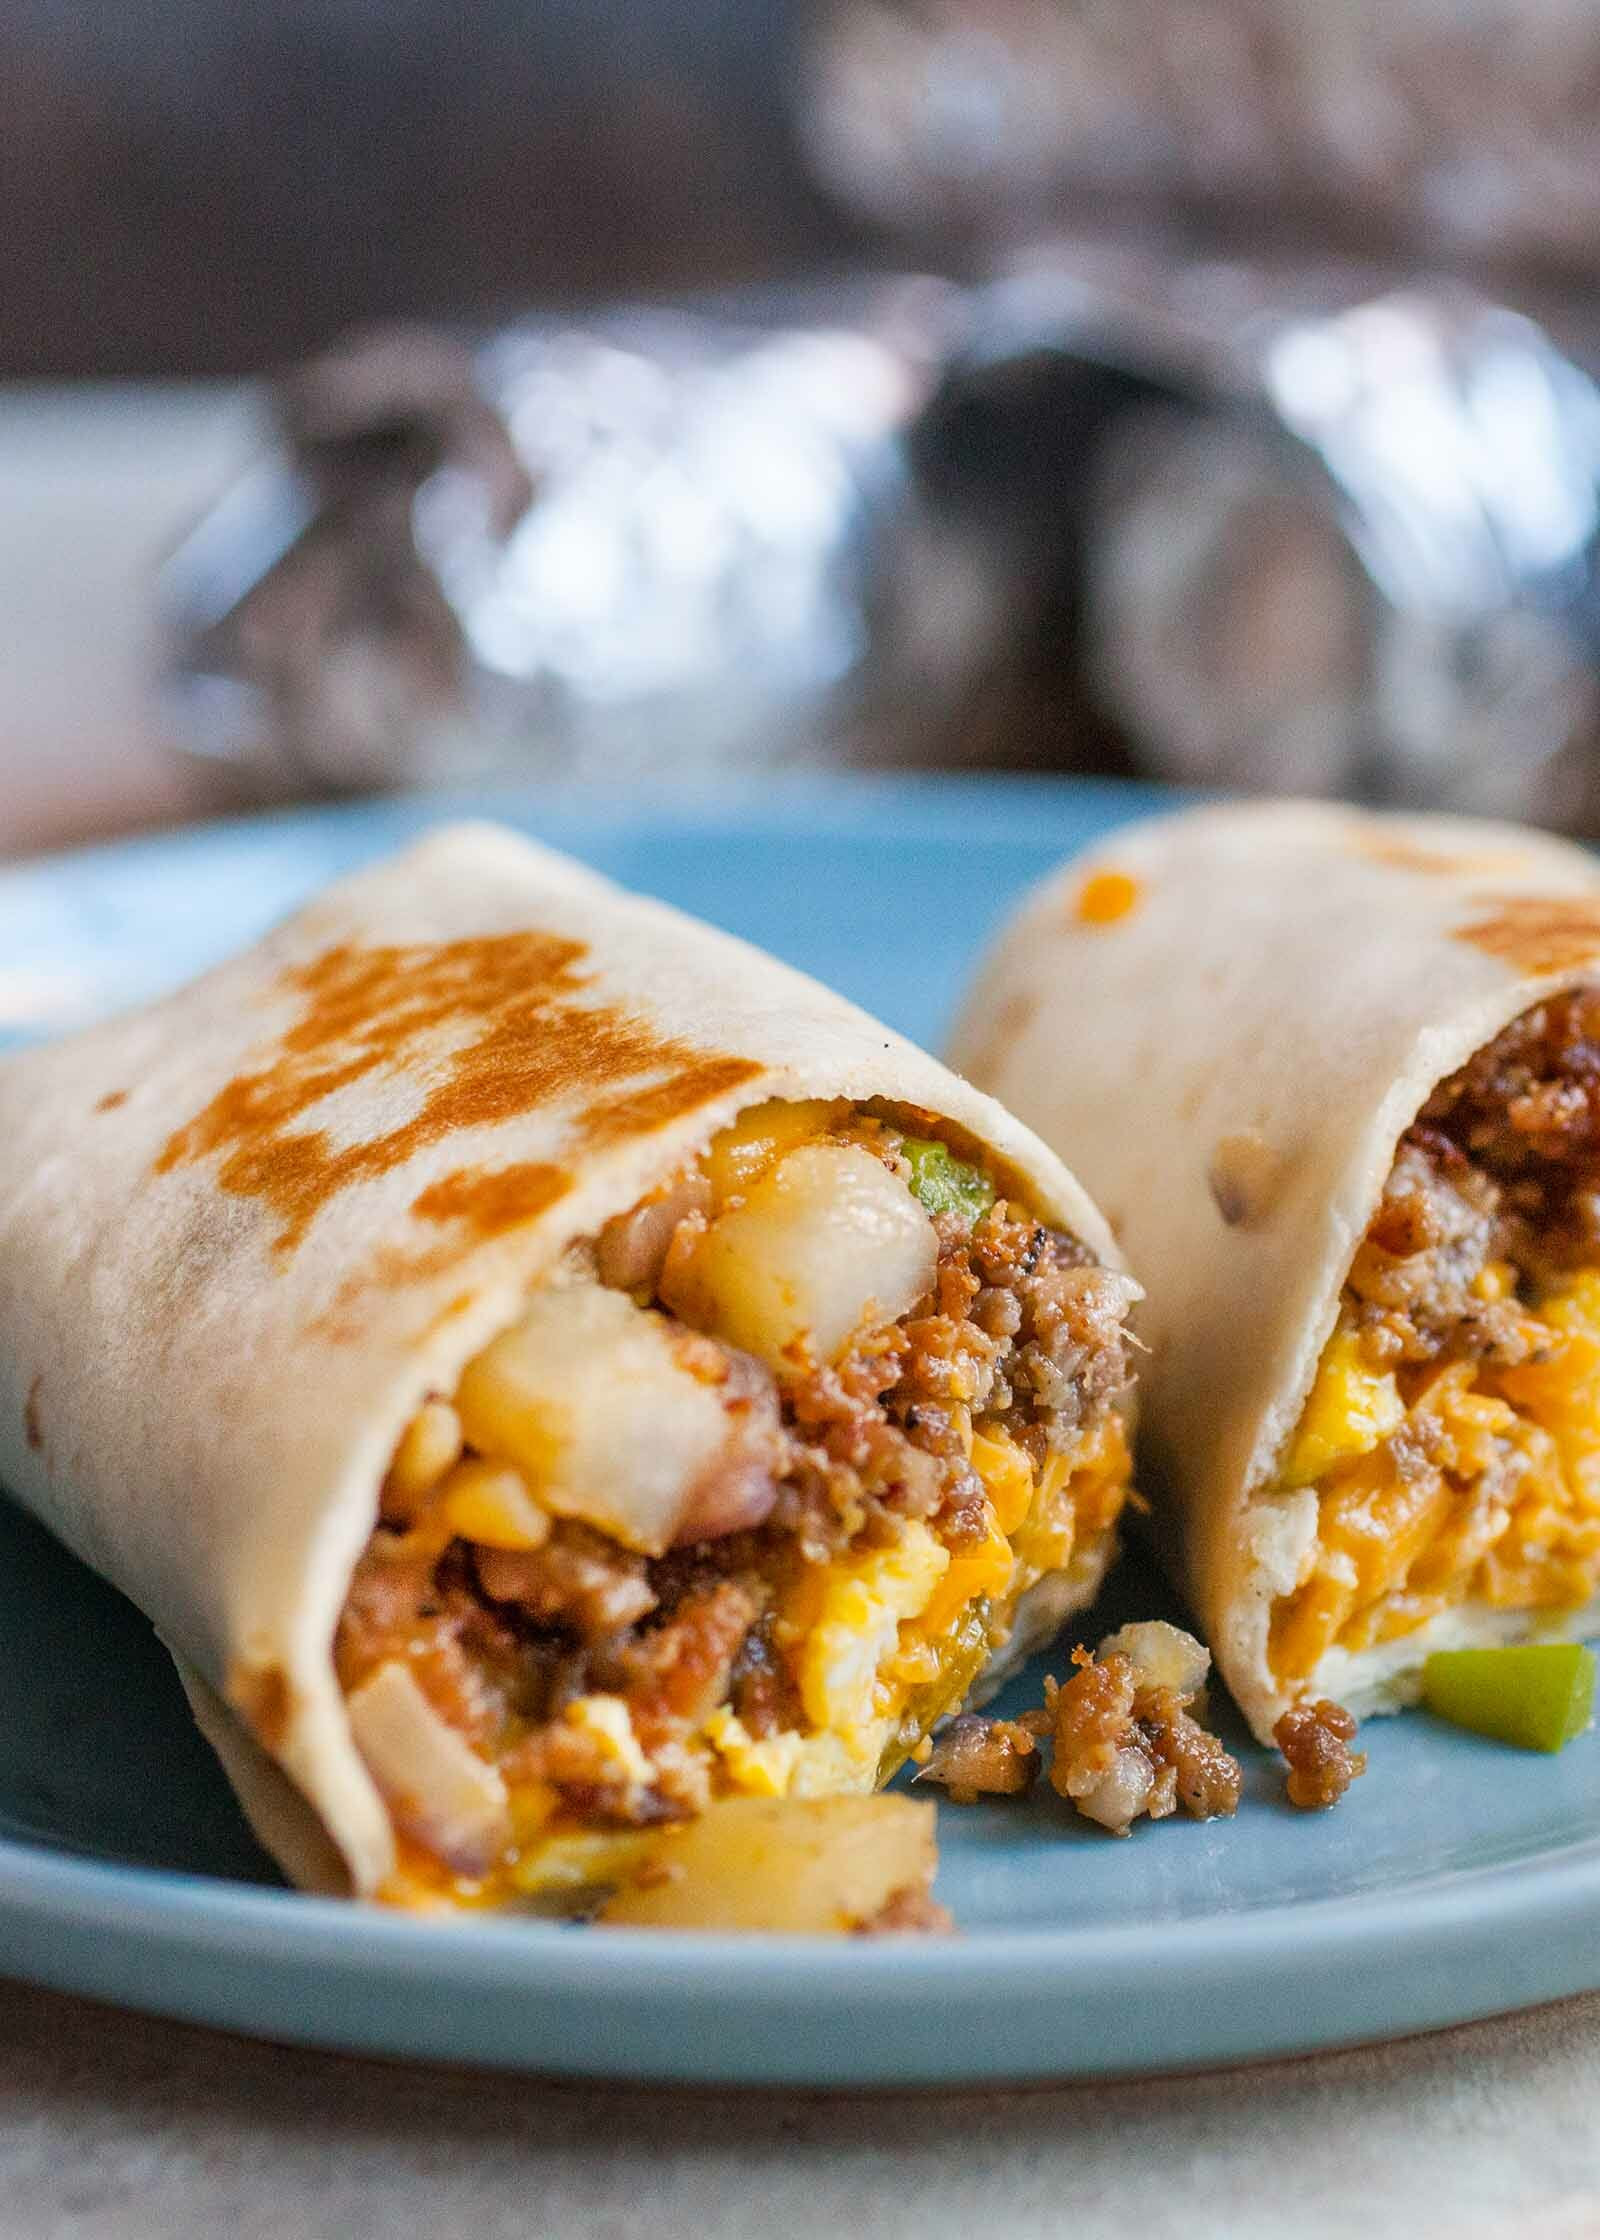 Breakfast Burritos Recipe  Freezer Breakfast Burritos with Sausage Eggs and Salsa